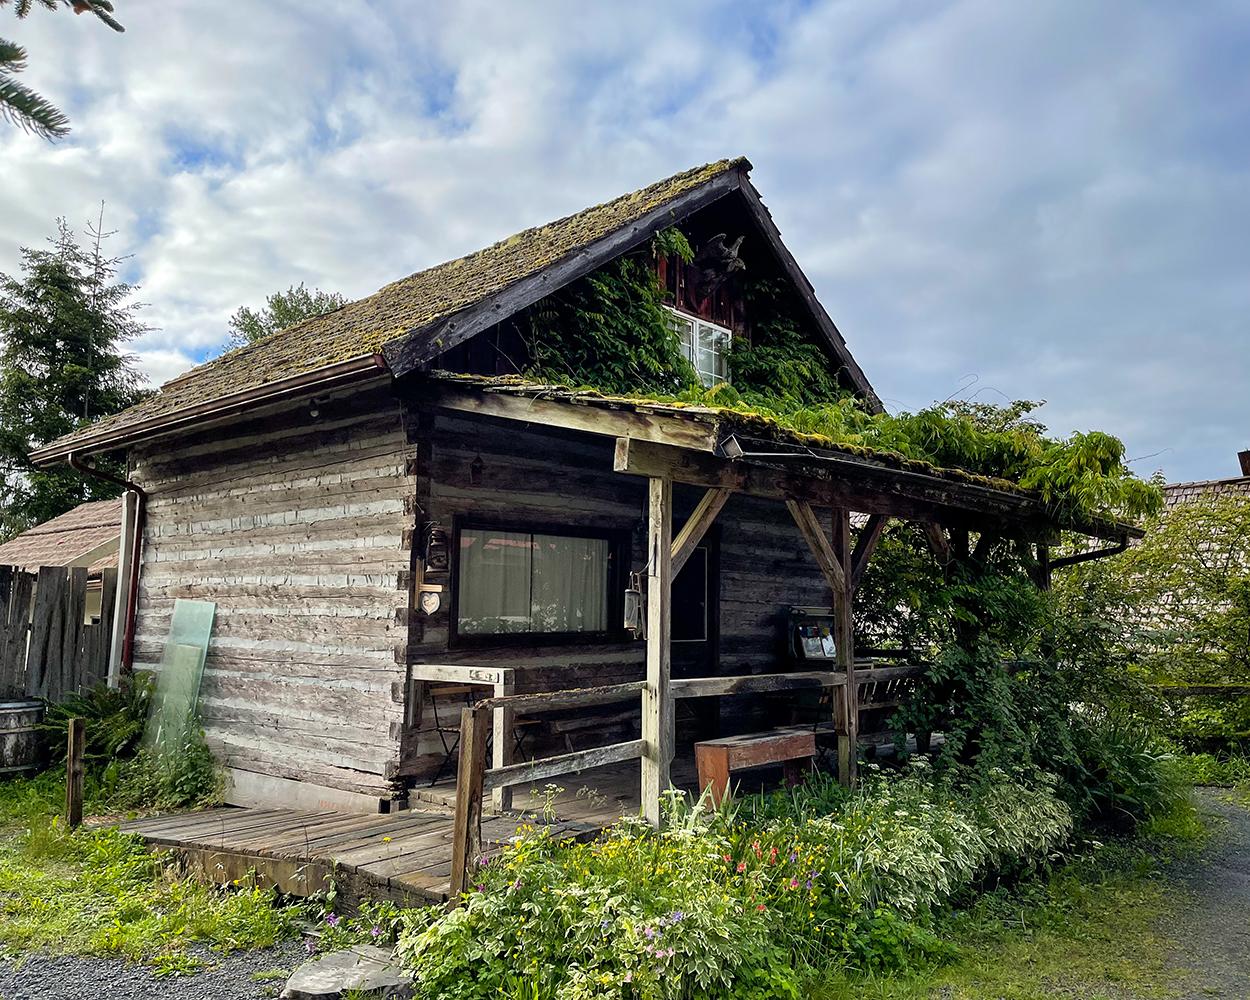 log style cabin at paradise village cabin near mount rainier national park in Ashford washington